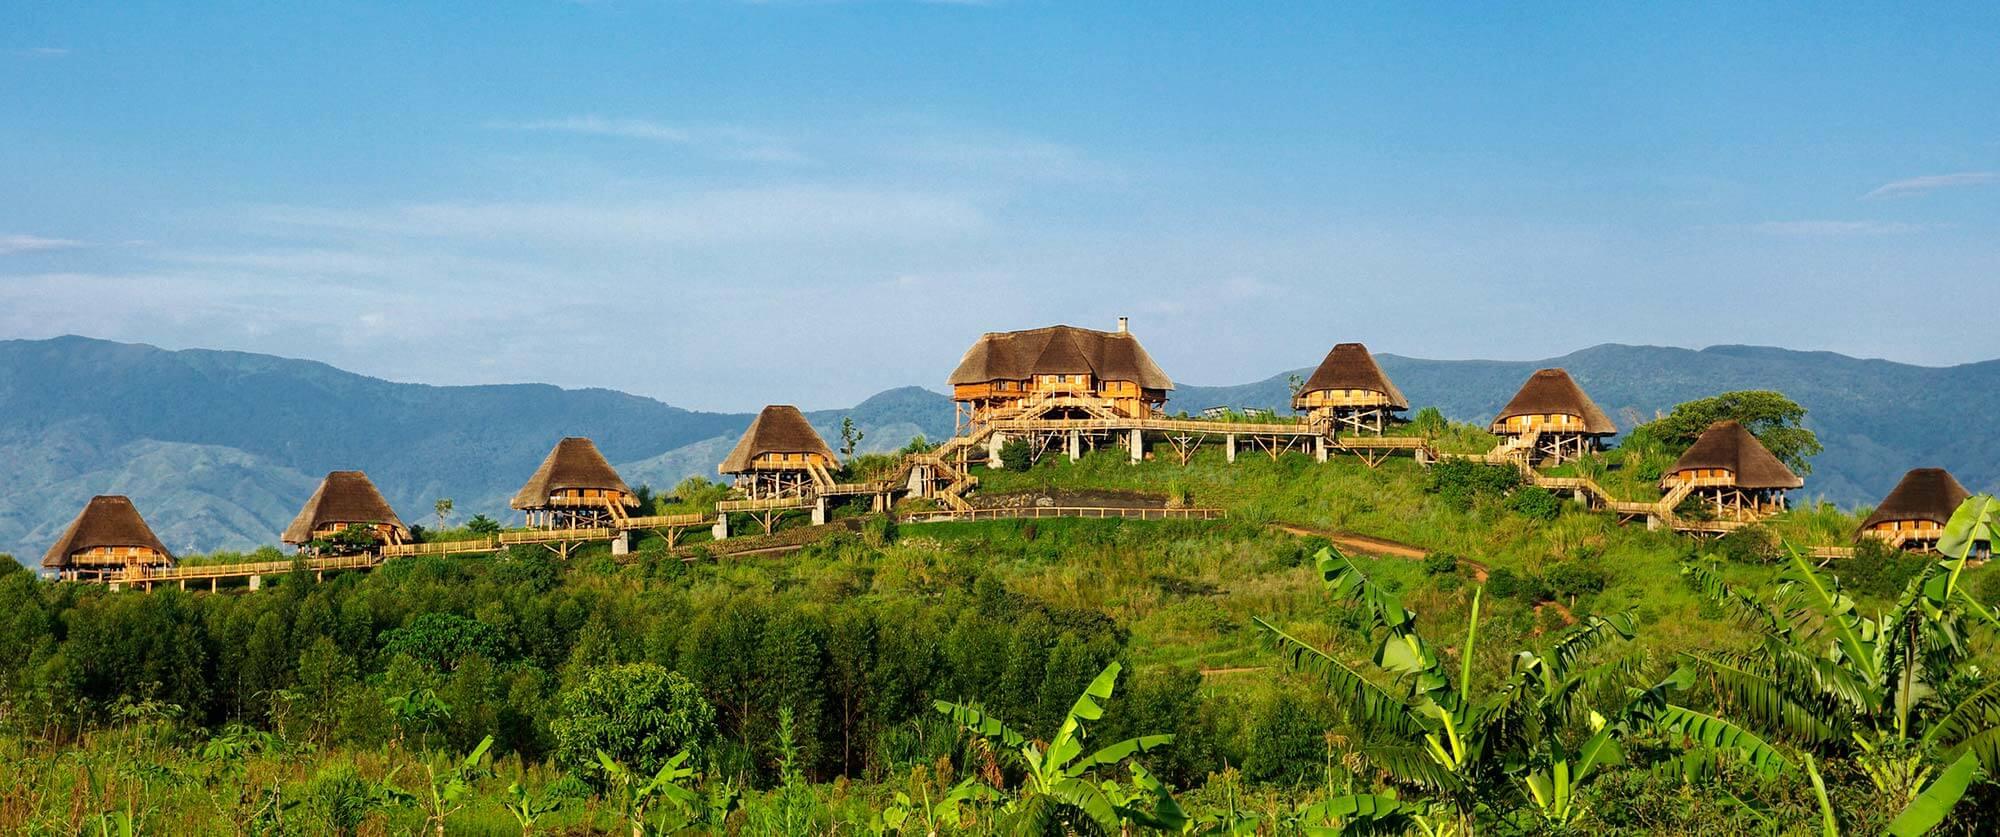 Kyaninga Lodge Uganda - Kibale National Park - Uganda and Rwanda Gorilla Trekking Tour